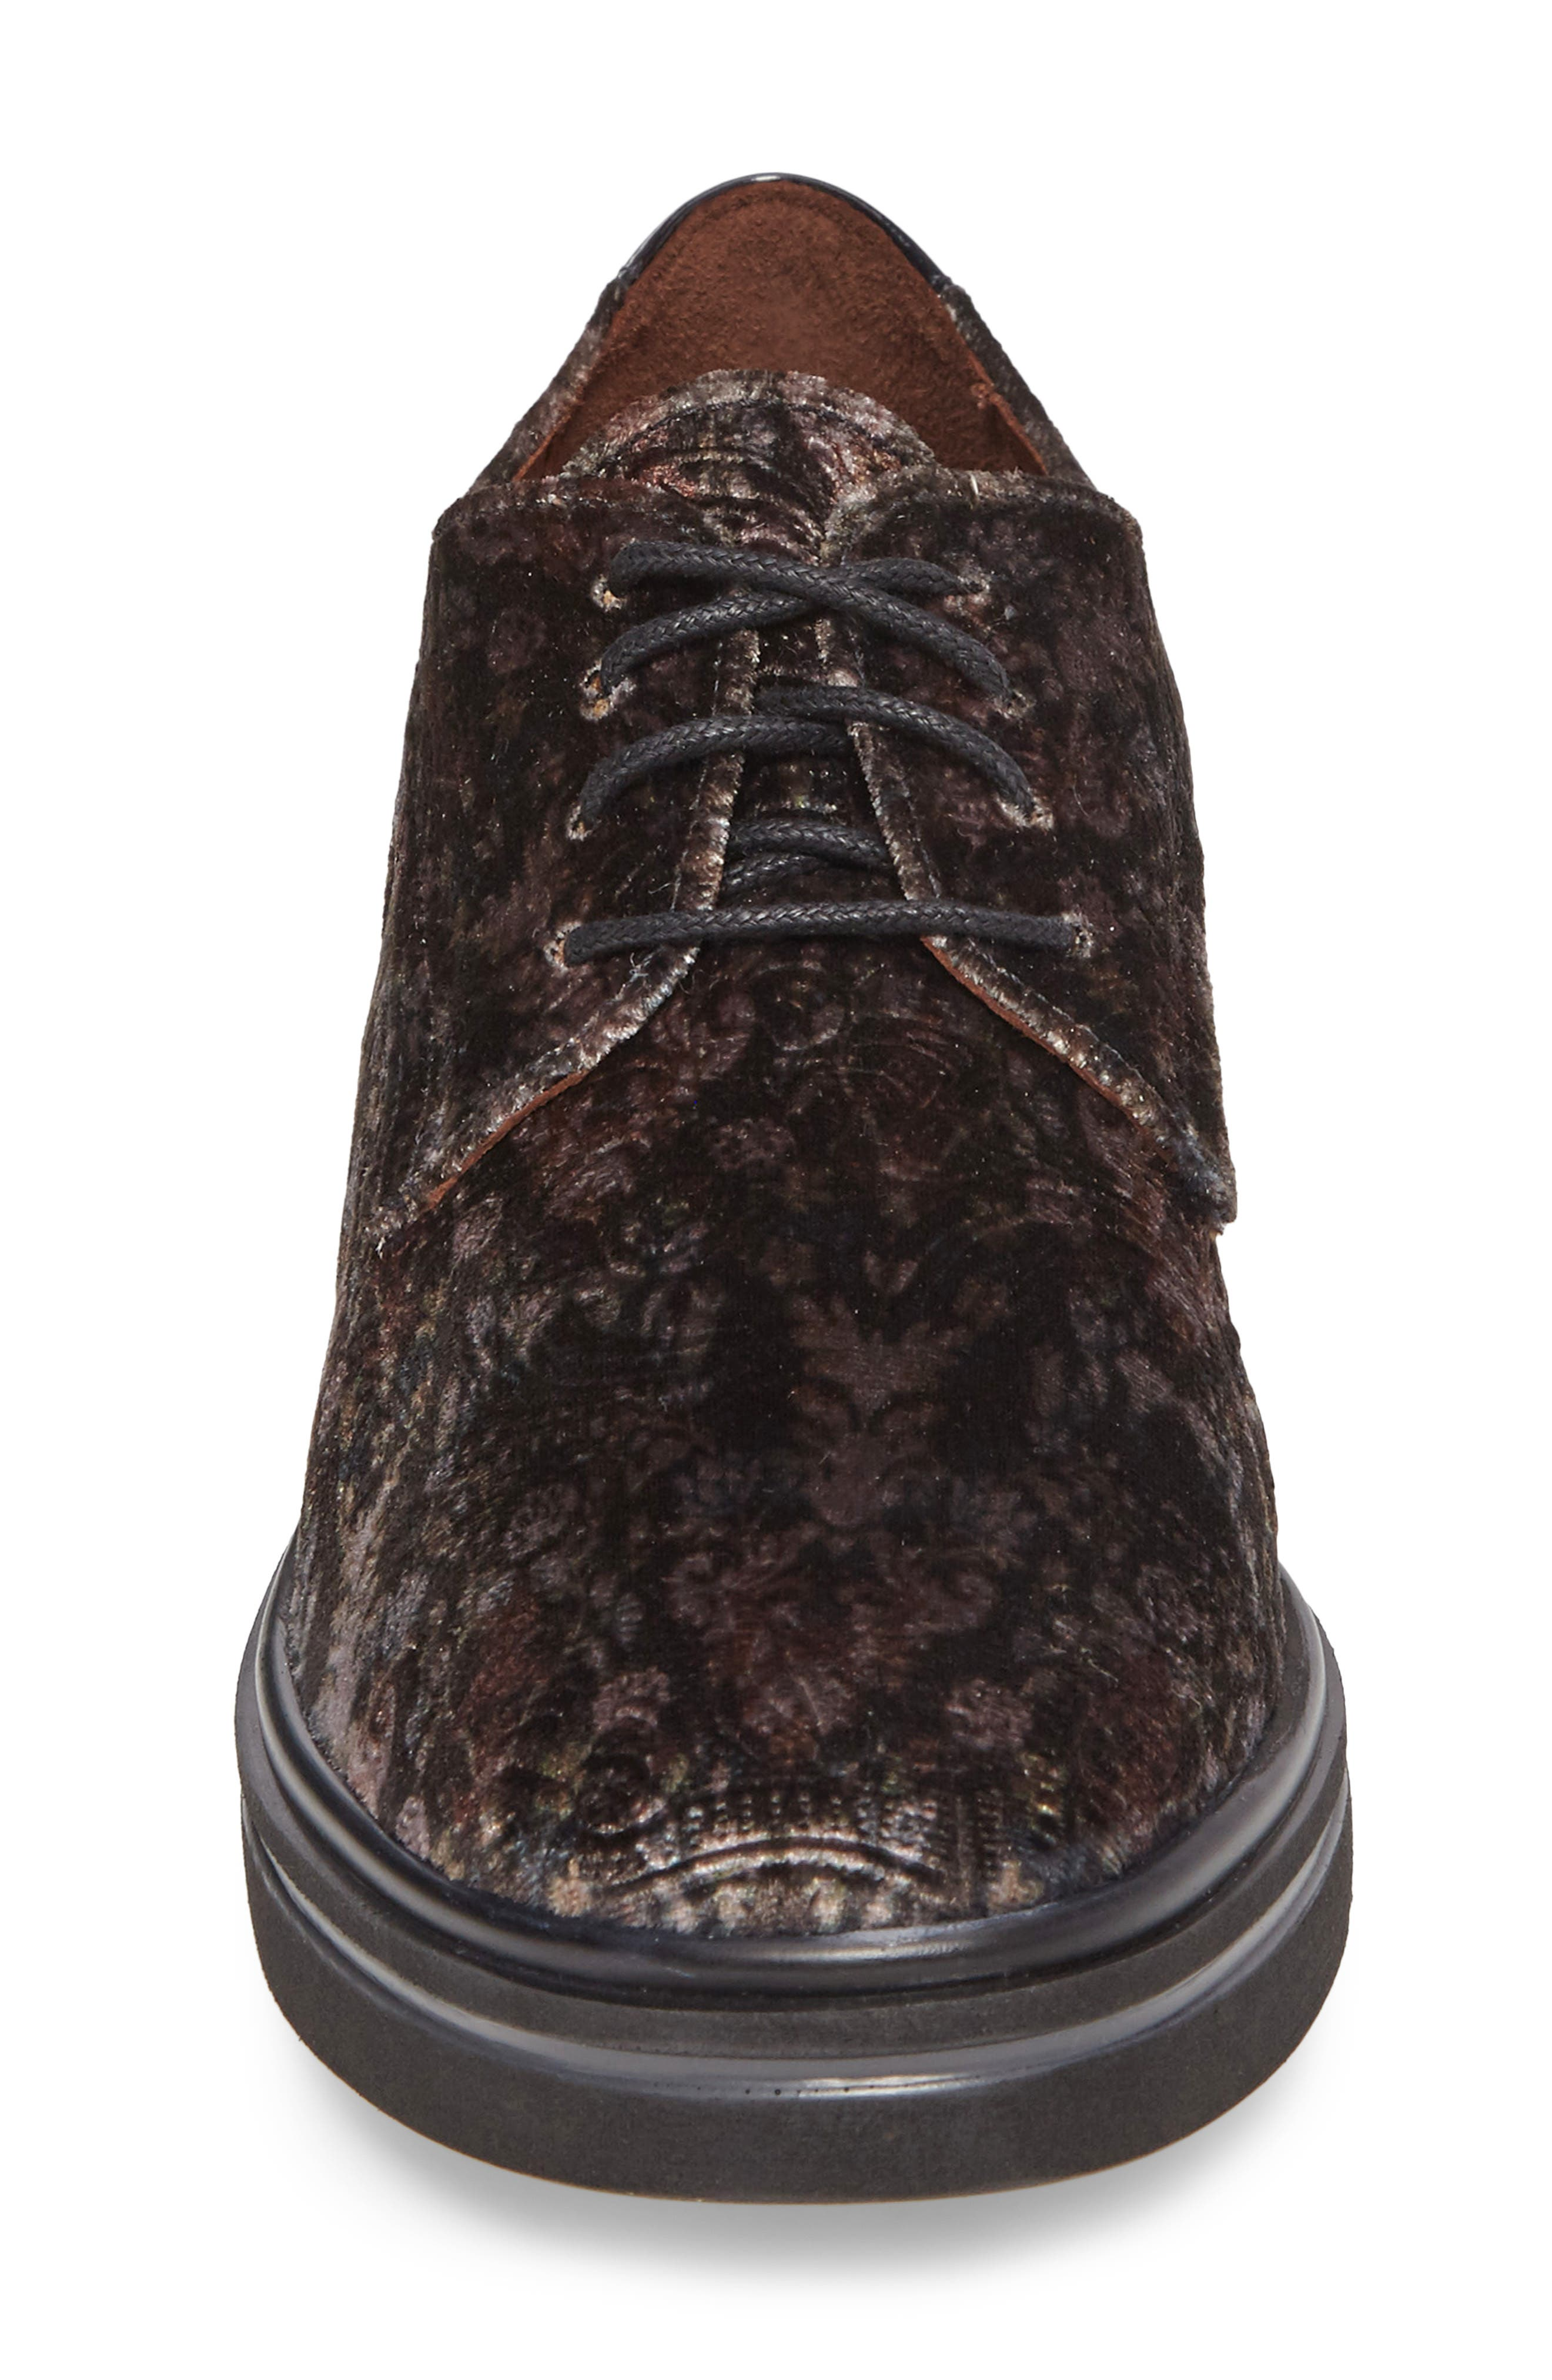 Richelle Oxford Sneaker,                             Alternate thumbnail 4, color,                             GREY FABRIC